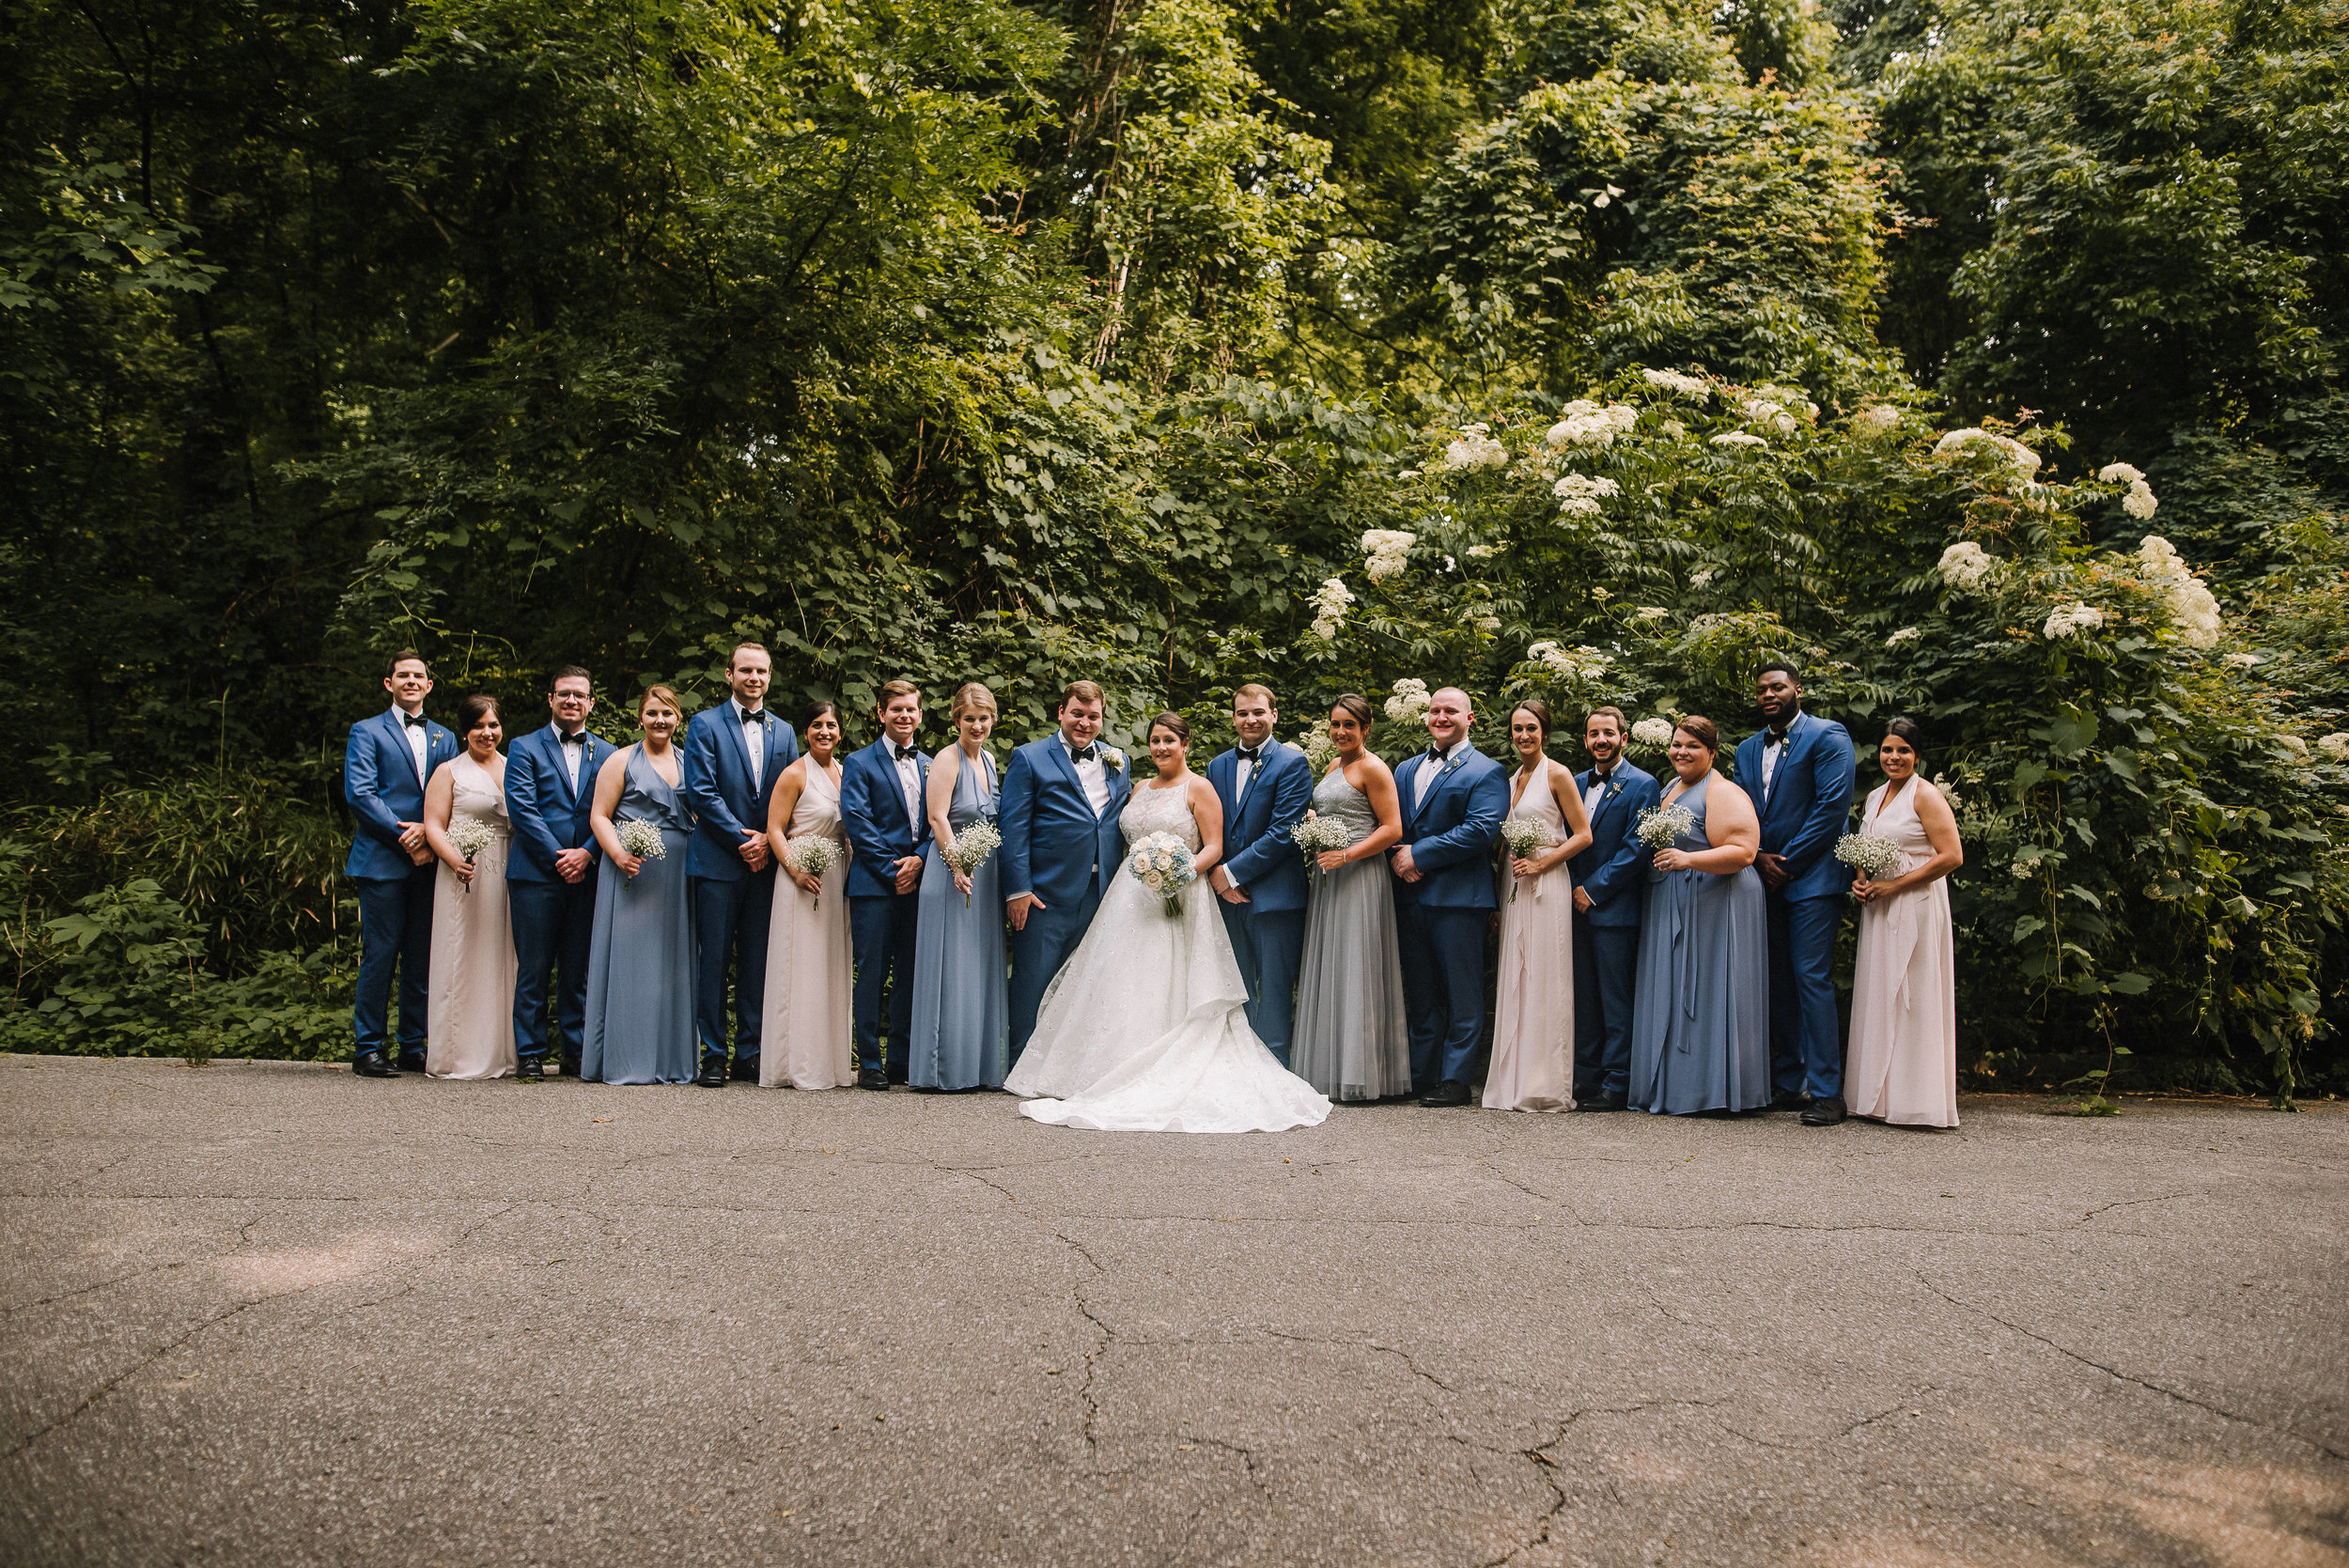 Smith Wedding_Memphis Zoo_Ashley Benham Photography-332.jpg